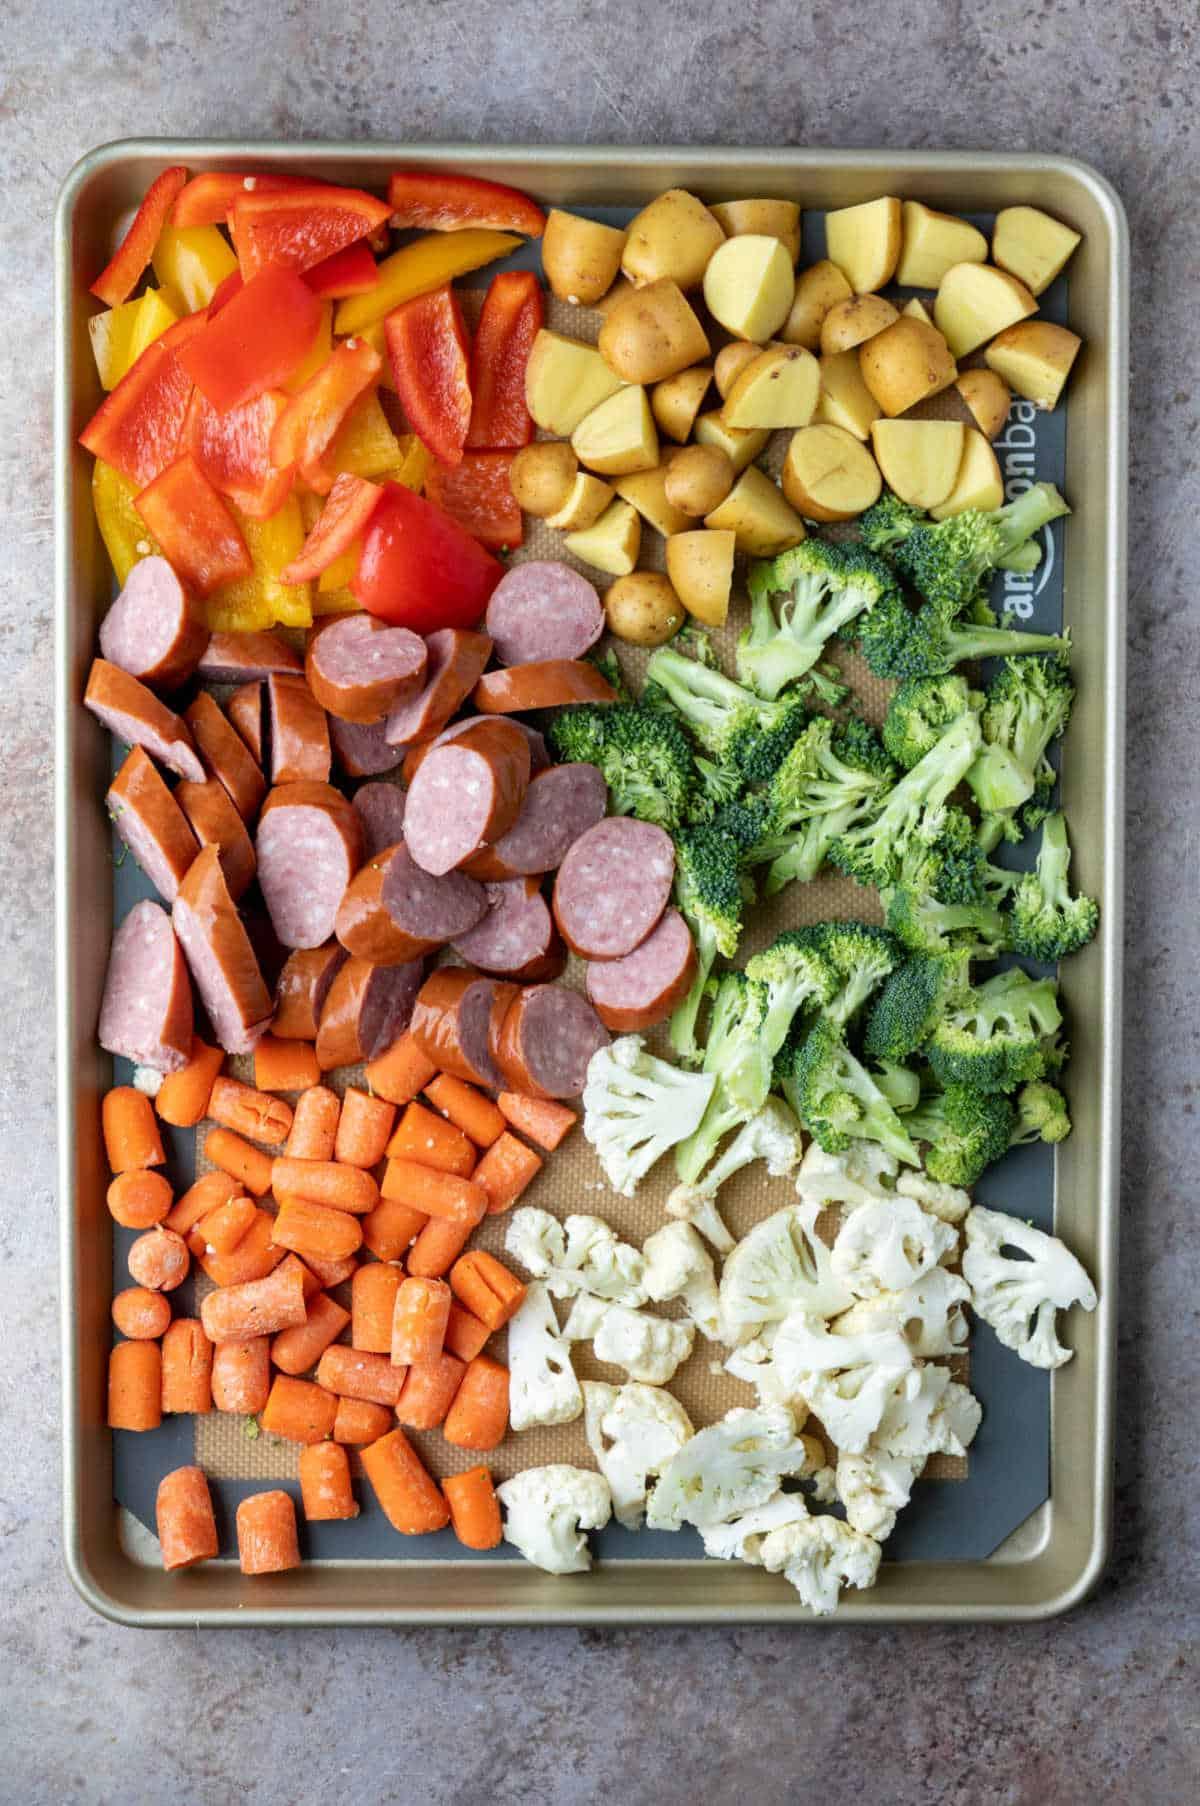 Veggies and sausage on a sheet pan.